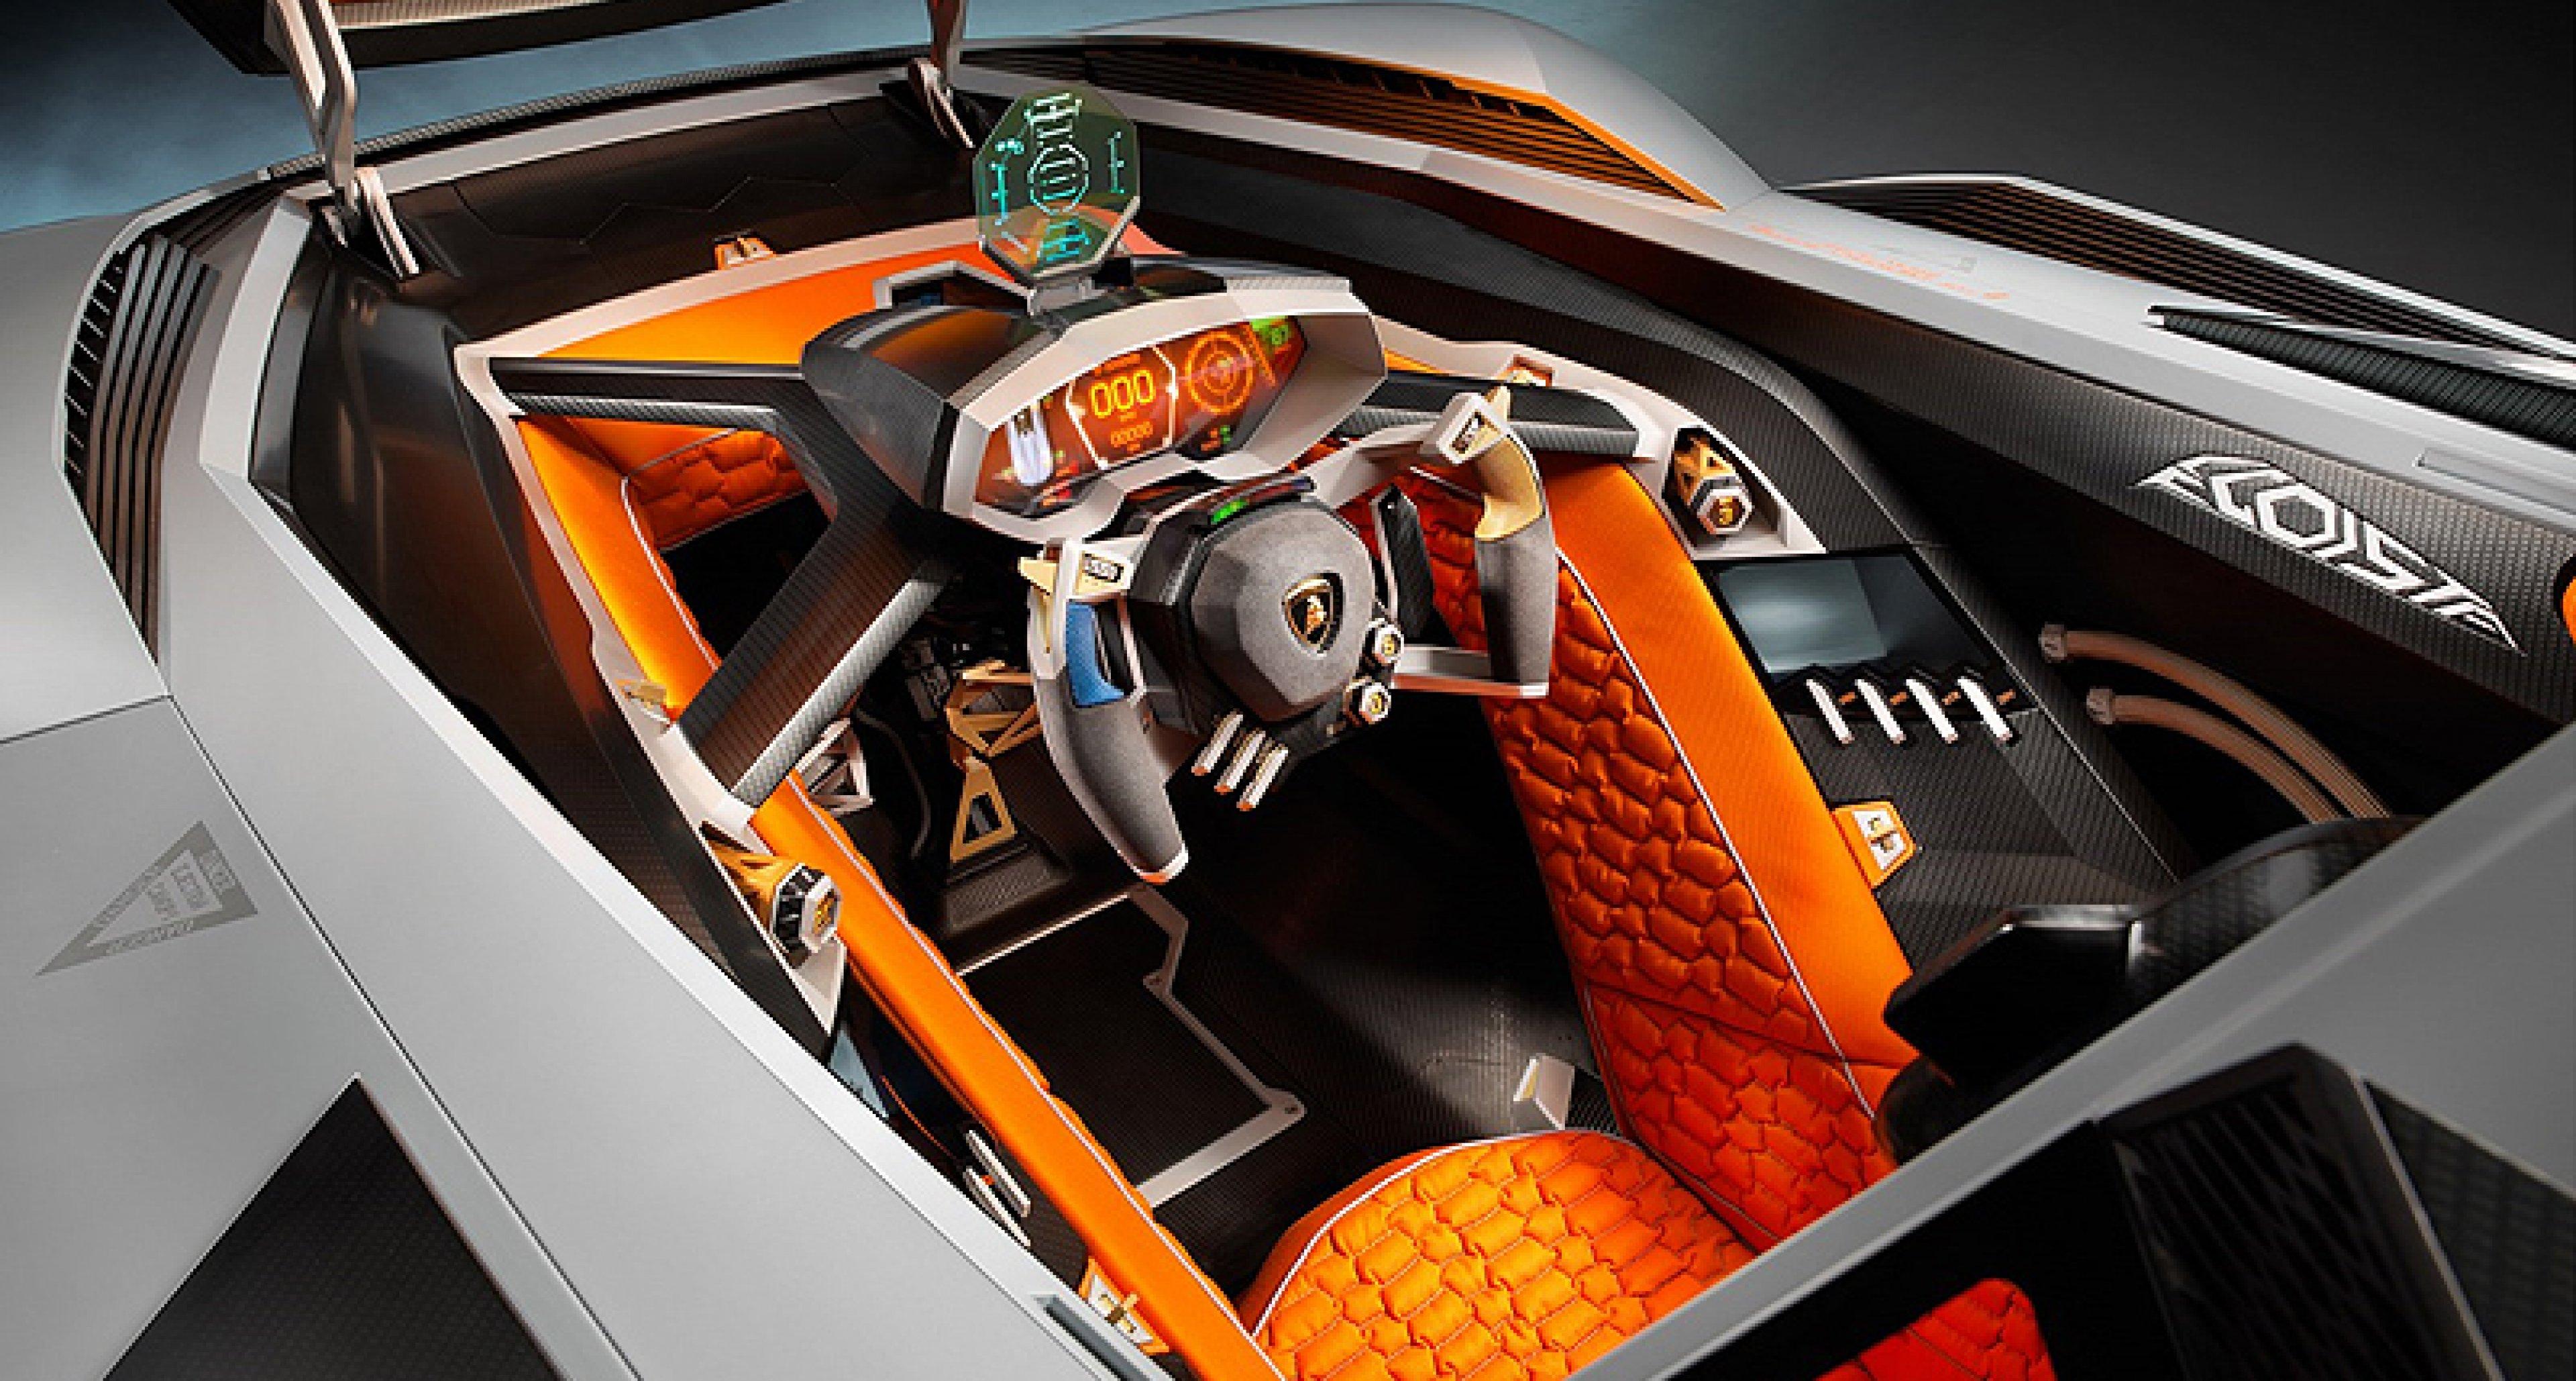 Lamborghini_Egoista_03pop.jpg